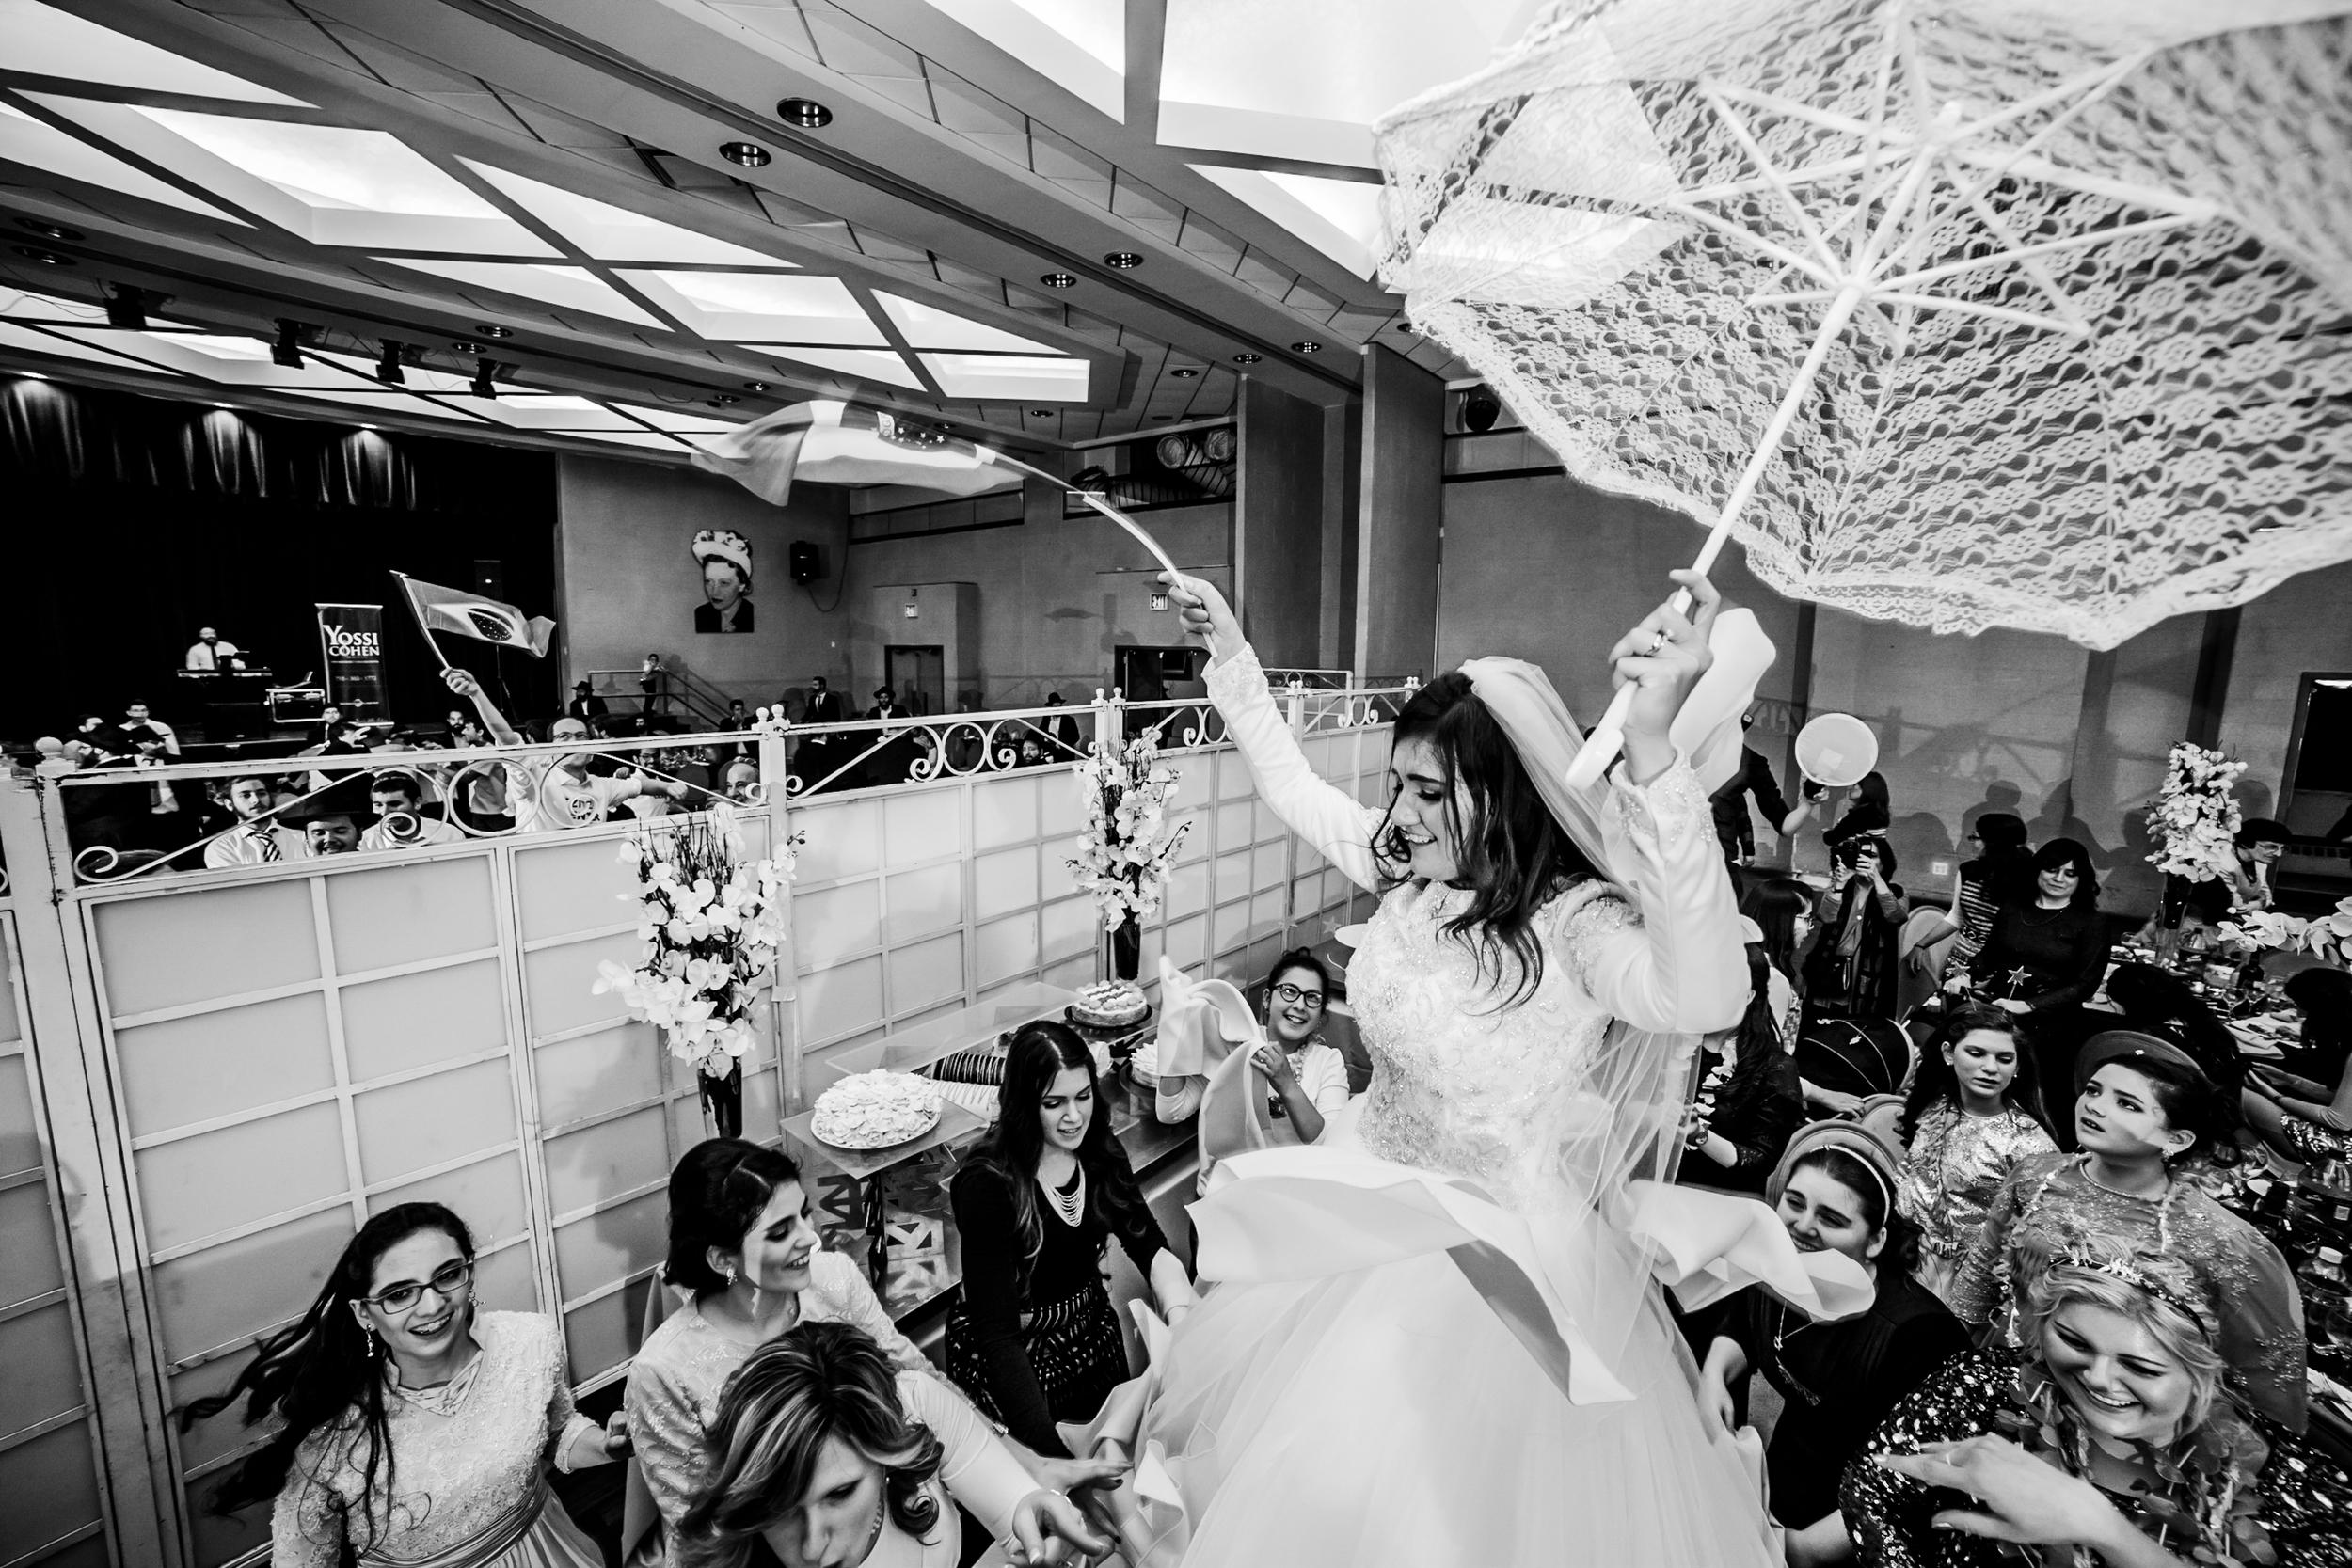 Wedding Iossi and Gitty Khafif  - Eliau Piha studio photography, new york, events, people 770 brooklyn -0891.jpg